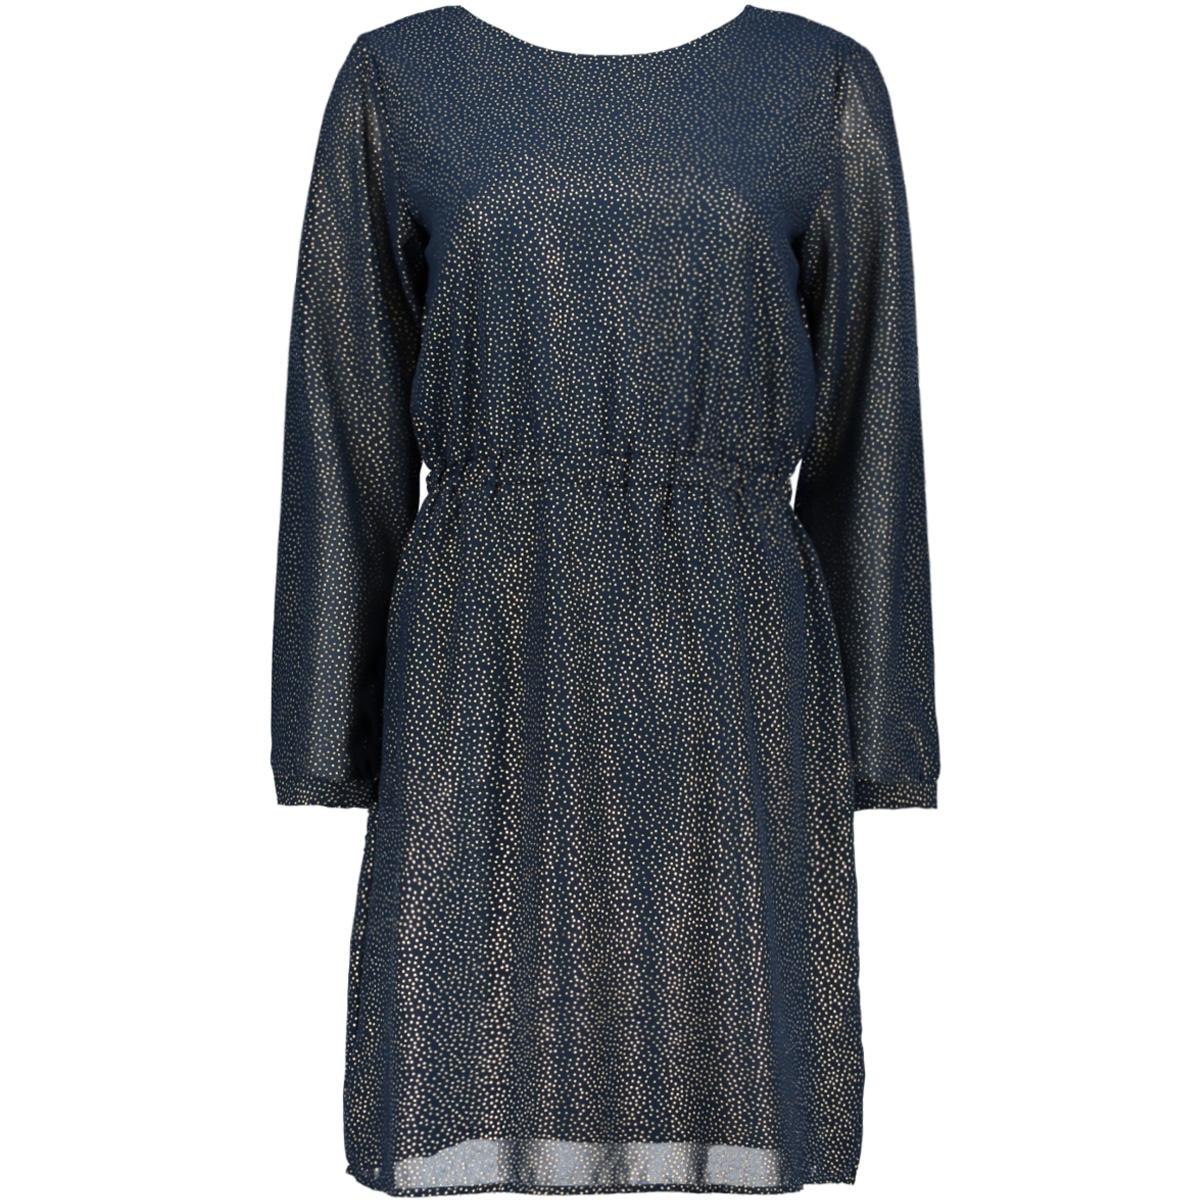 objhollie l/s dress a wi 23029434 object jurk sky captain/gold foil